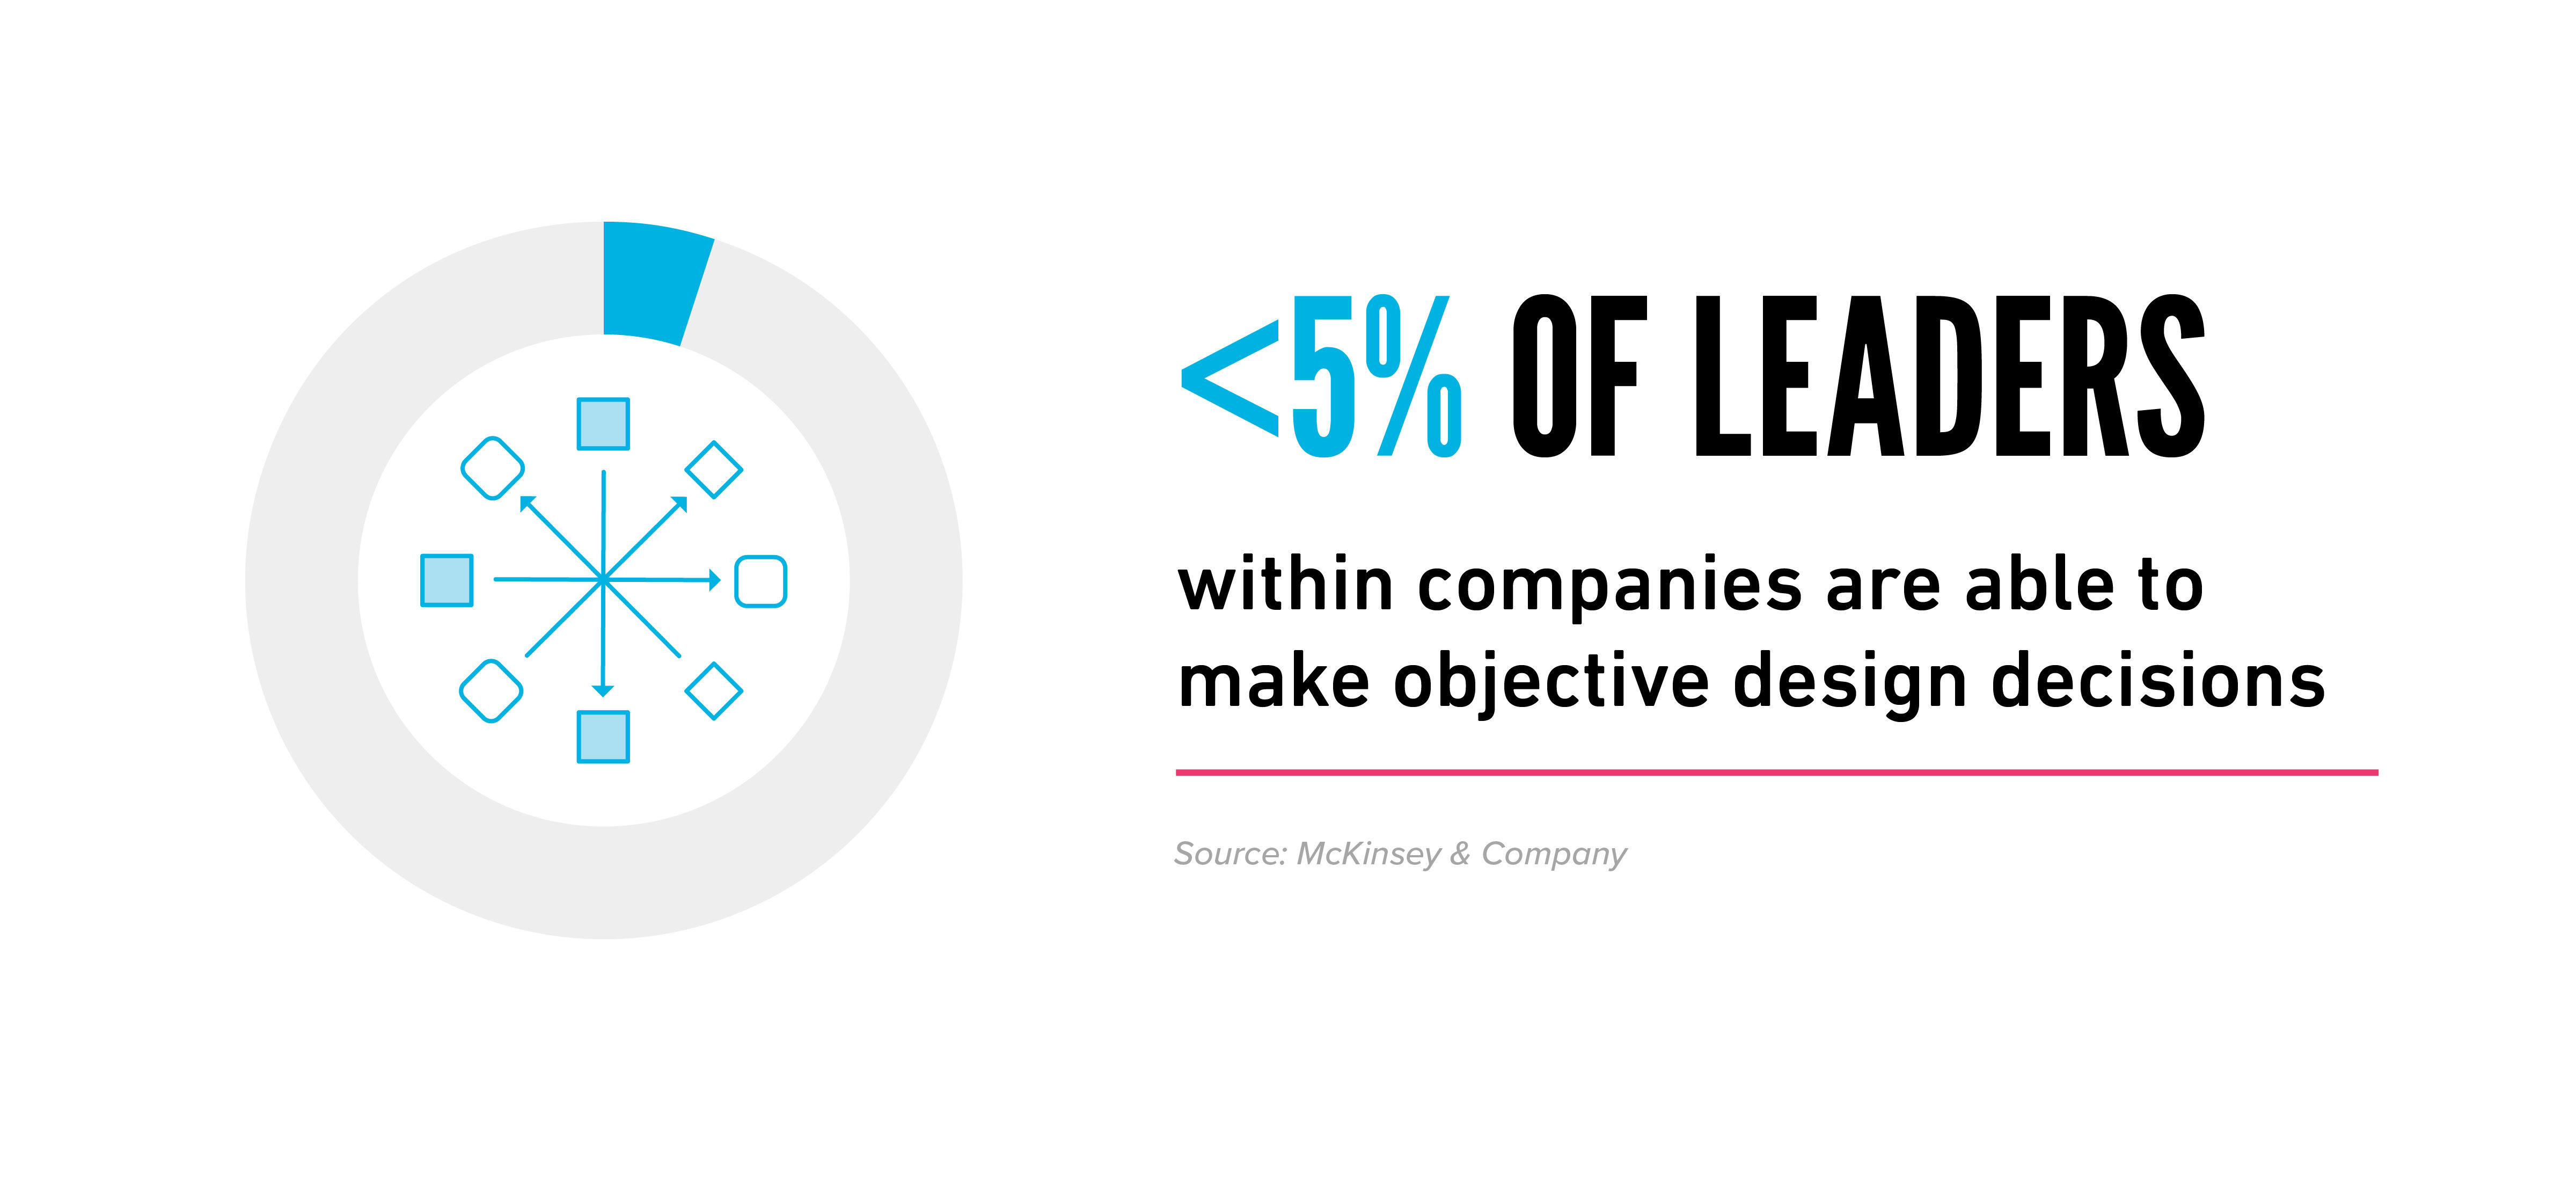 Corporate communication leadership stat